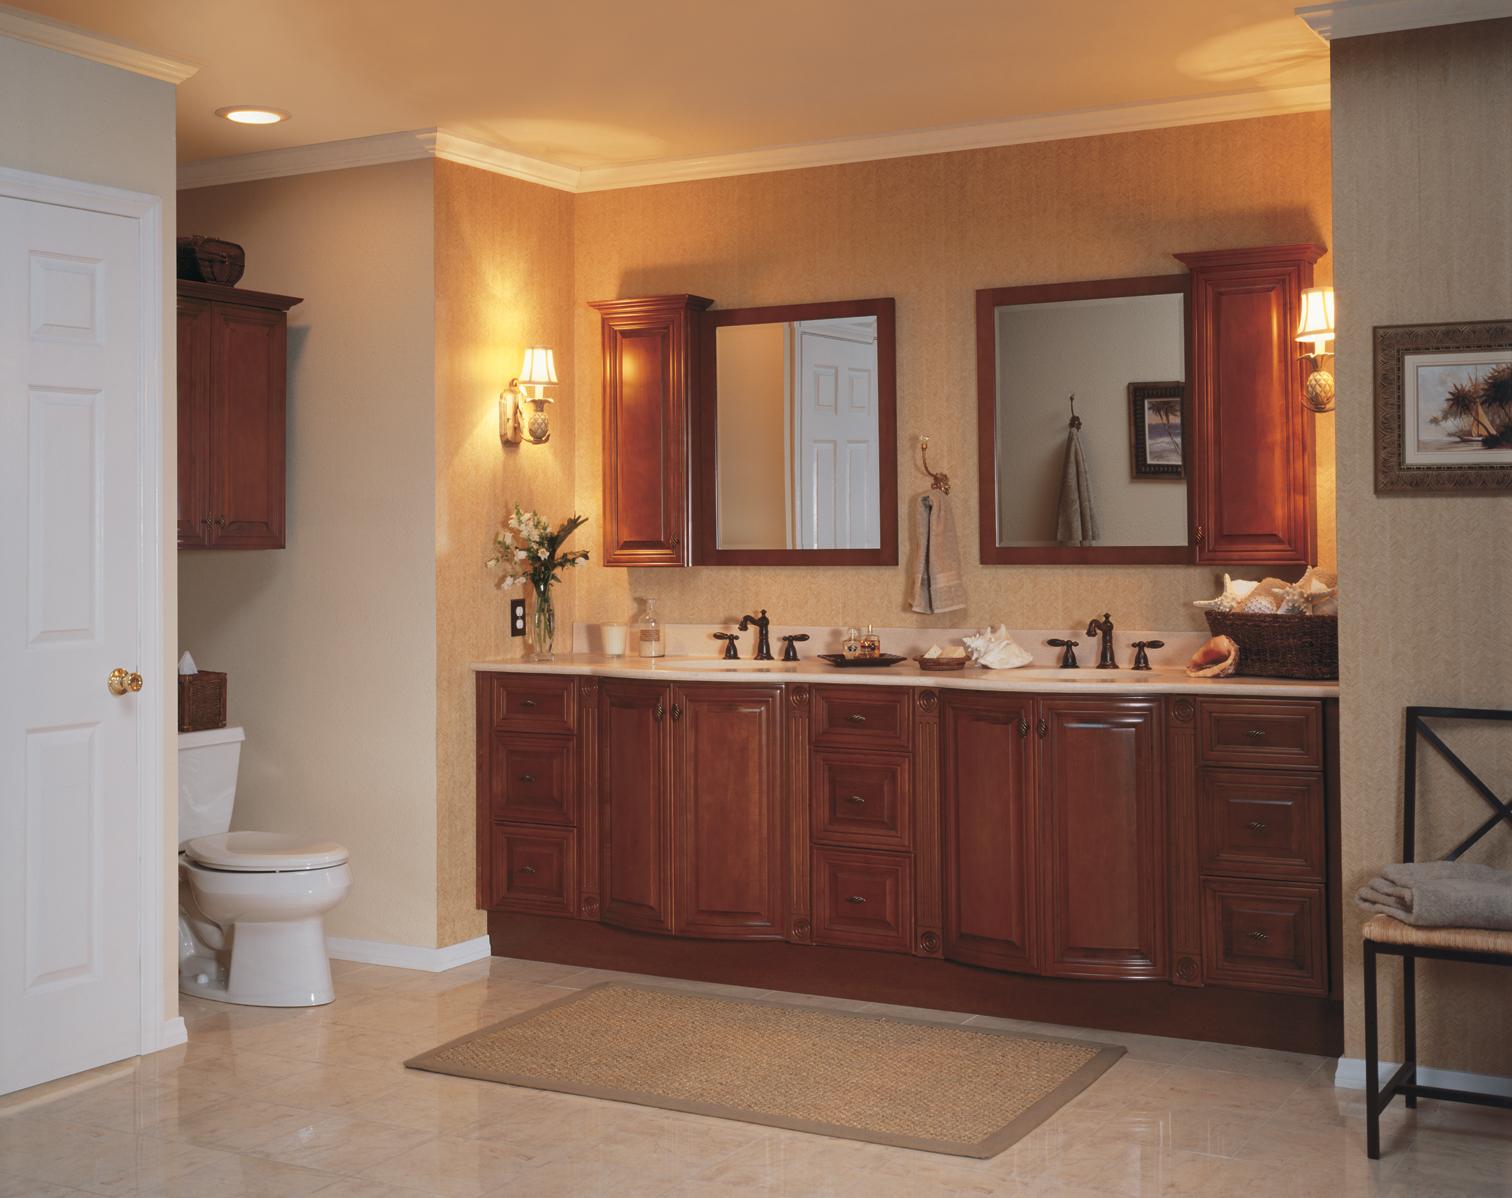 Bathroom Remodel Ideas With Oak Cabinets Custom Design Cabinets |  Jmarvinhandyman